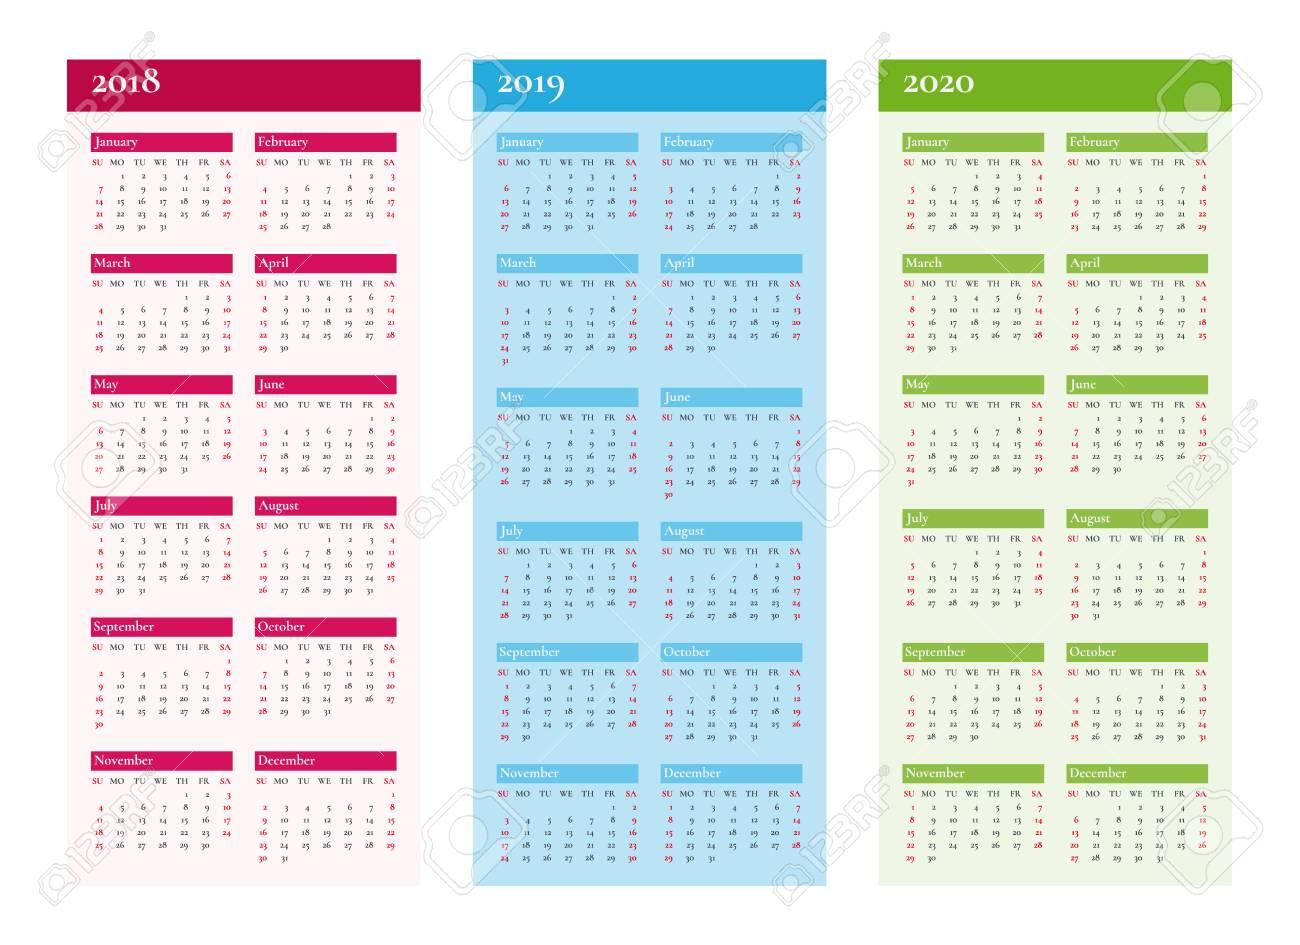 Calendar February 2019 Verticale Vertical Calendar For 2018 2019 2020 Royalty Free Cliparts